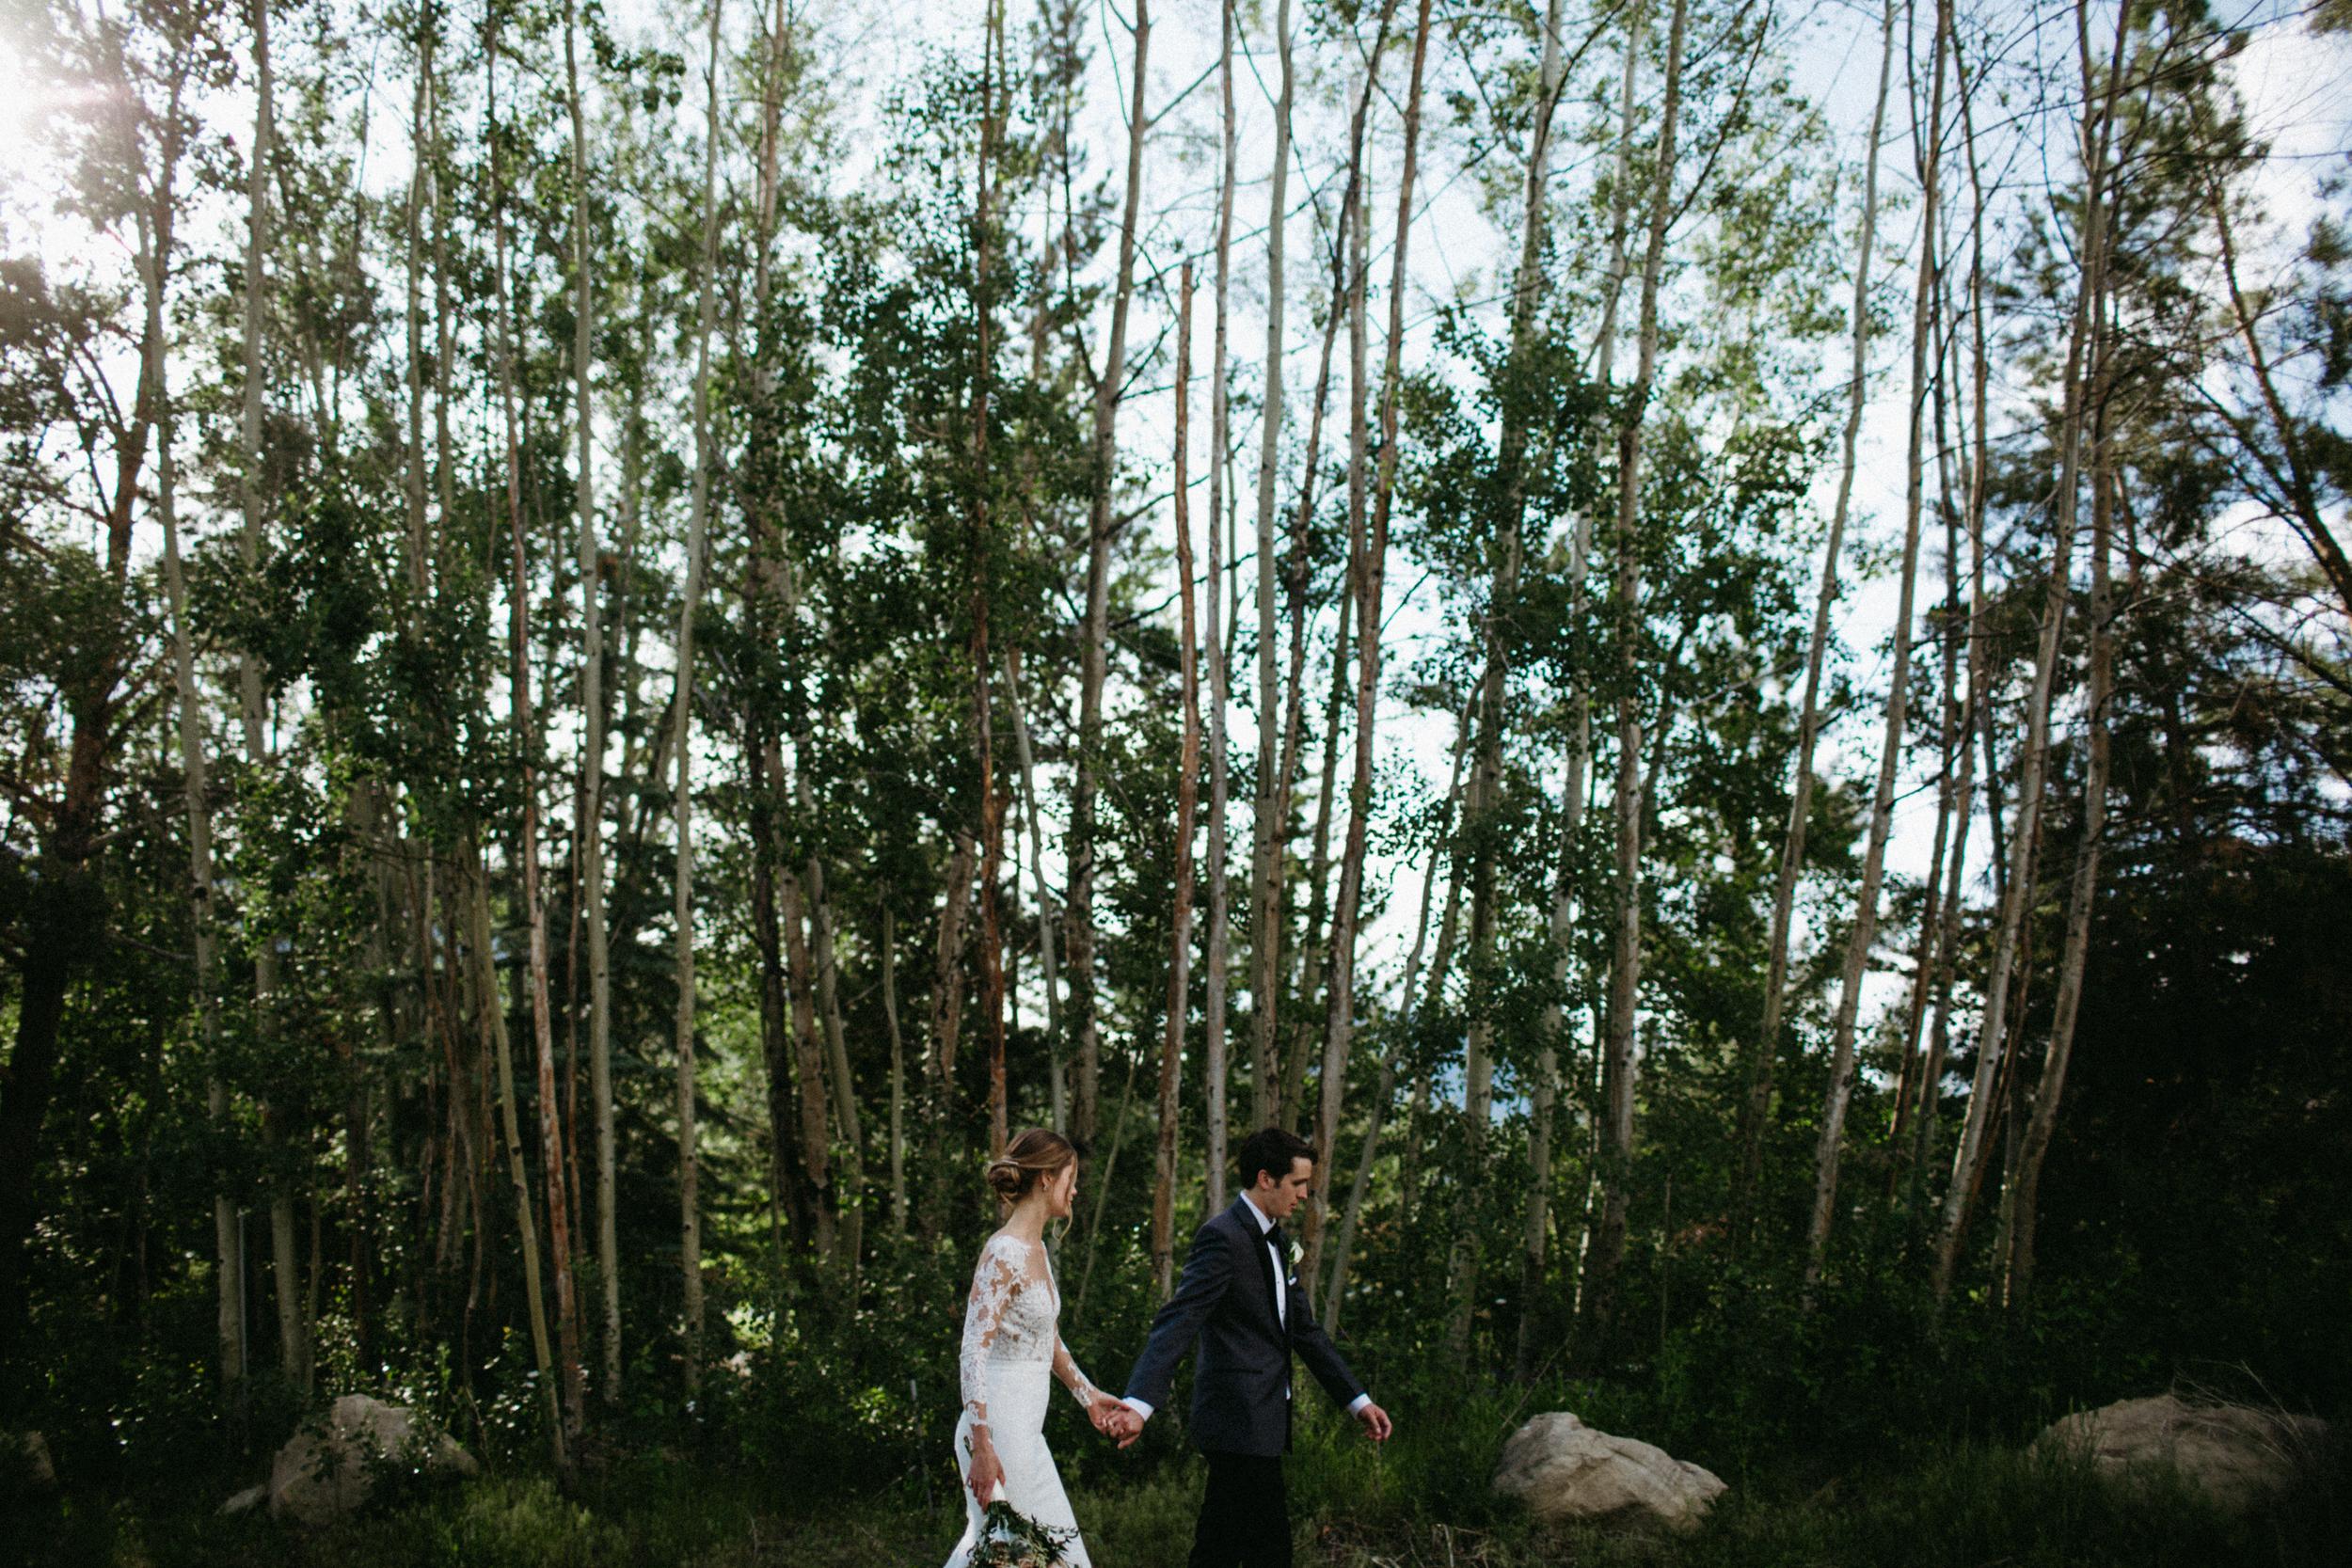 knob-hill-wedding-christinemarie-sun-valley-102.jpg